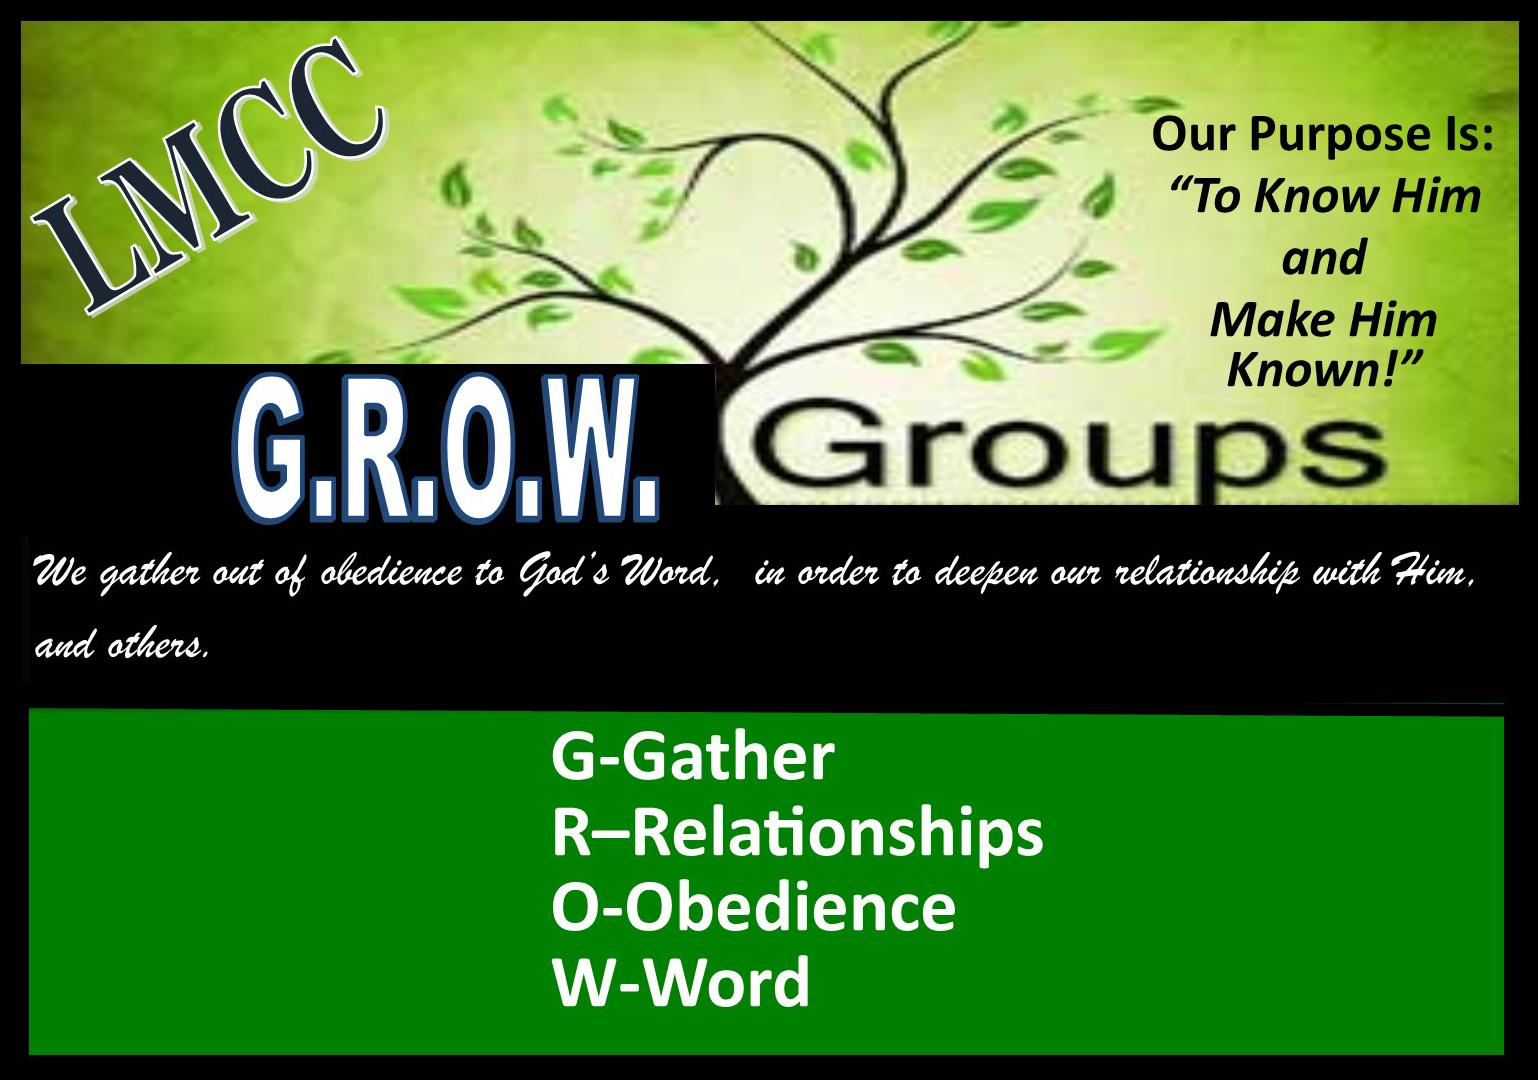 grow groups.jpg